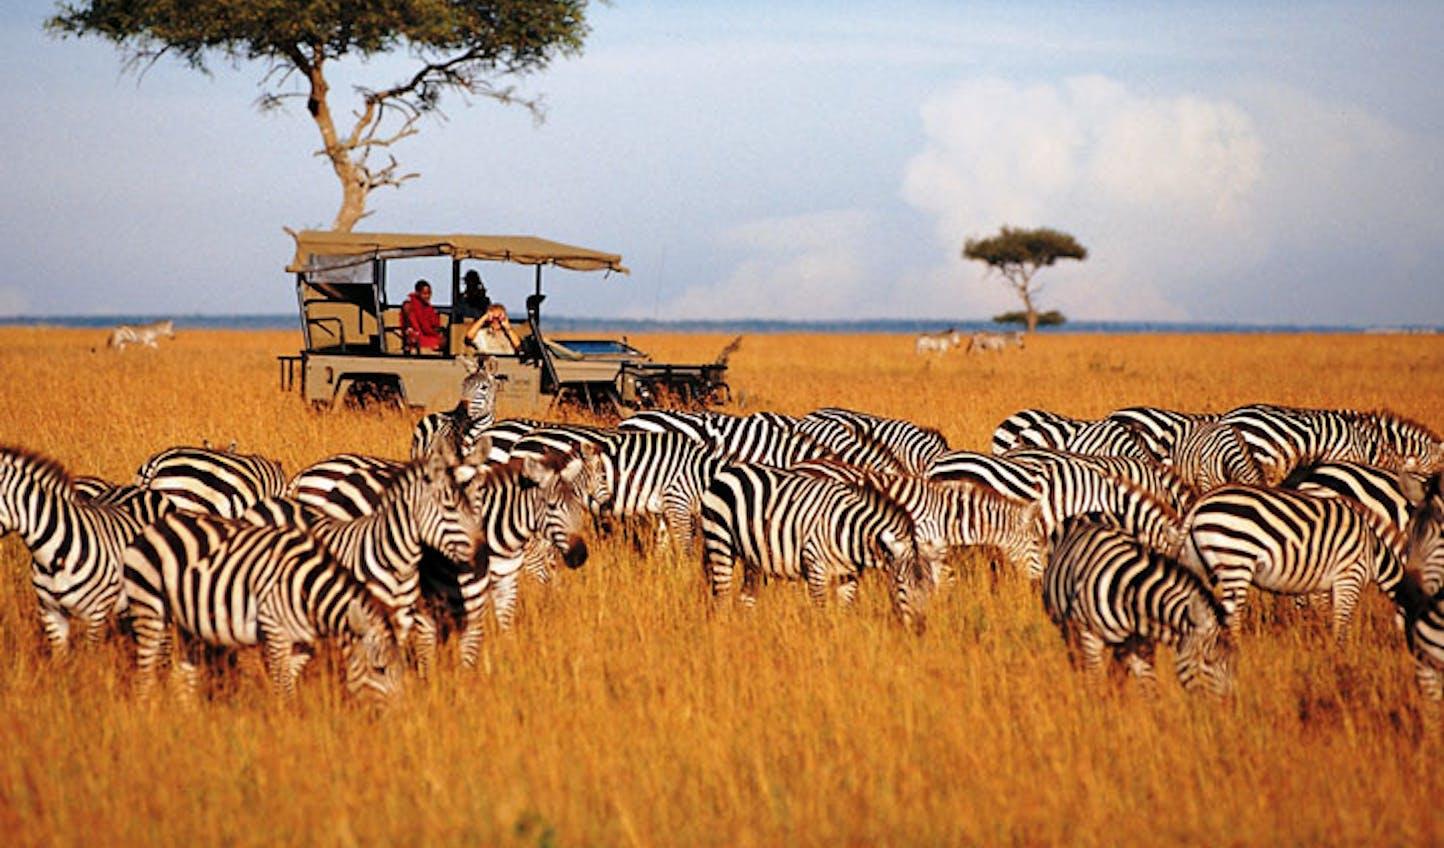 Safari jeep with zebra